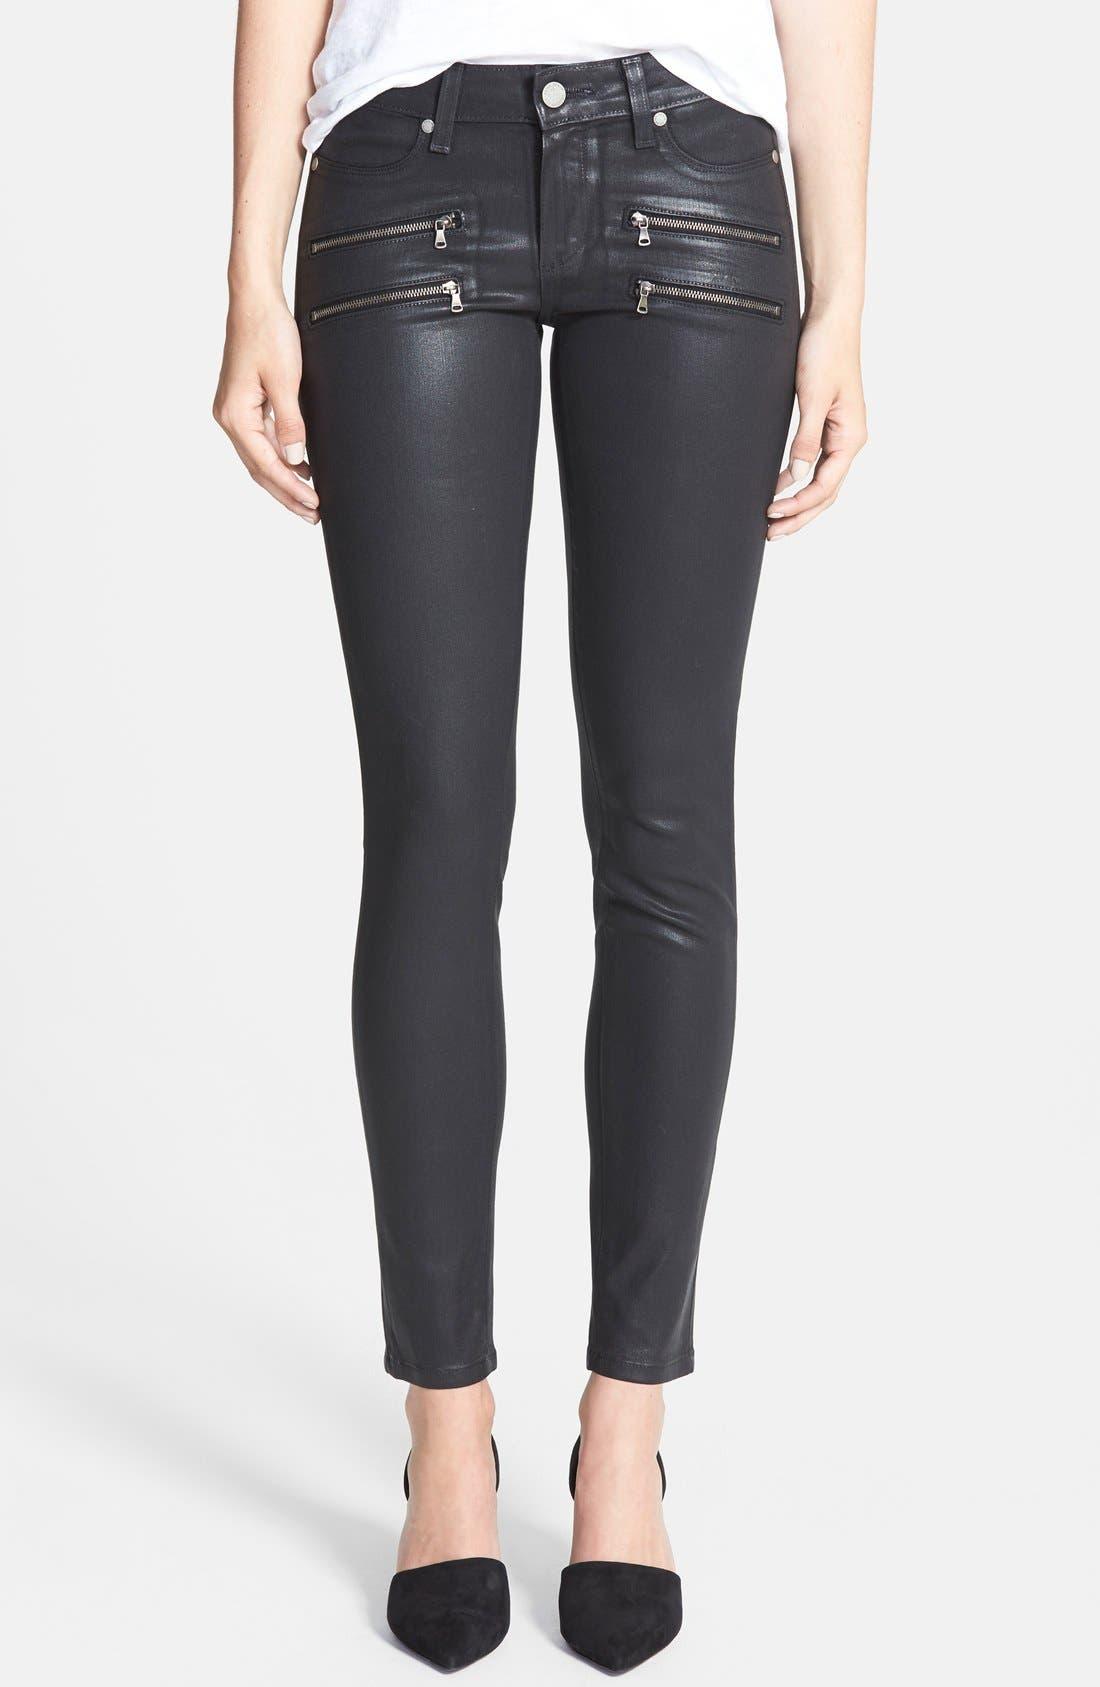 'Edgemont' Coated Ultra Skinny Jeans,                         Main,                         color, Black Silk